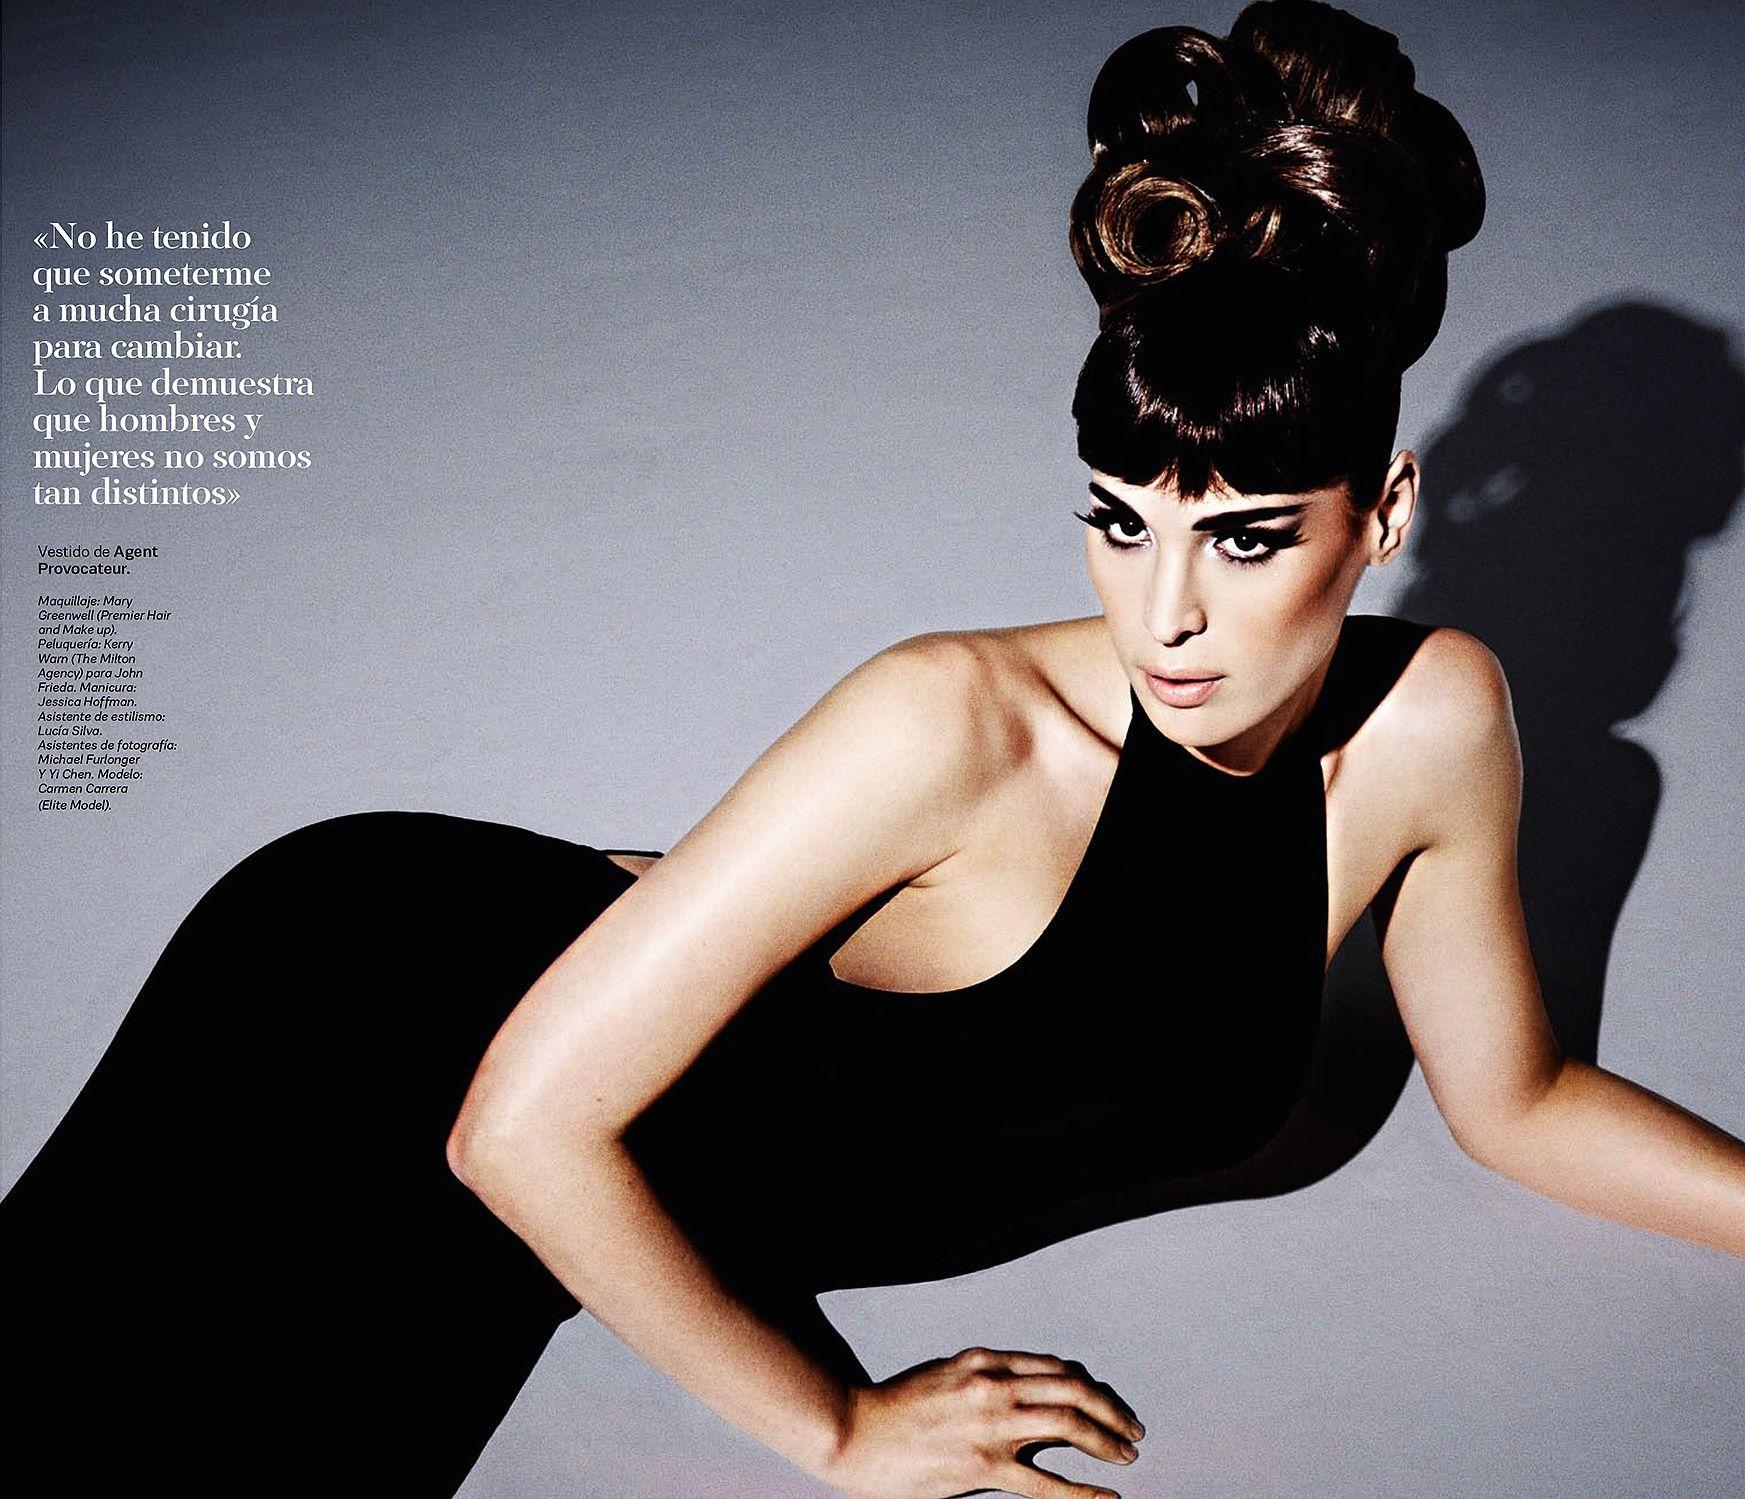 Beauty Crossdresser Androgynous Model - feminization.us